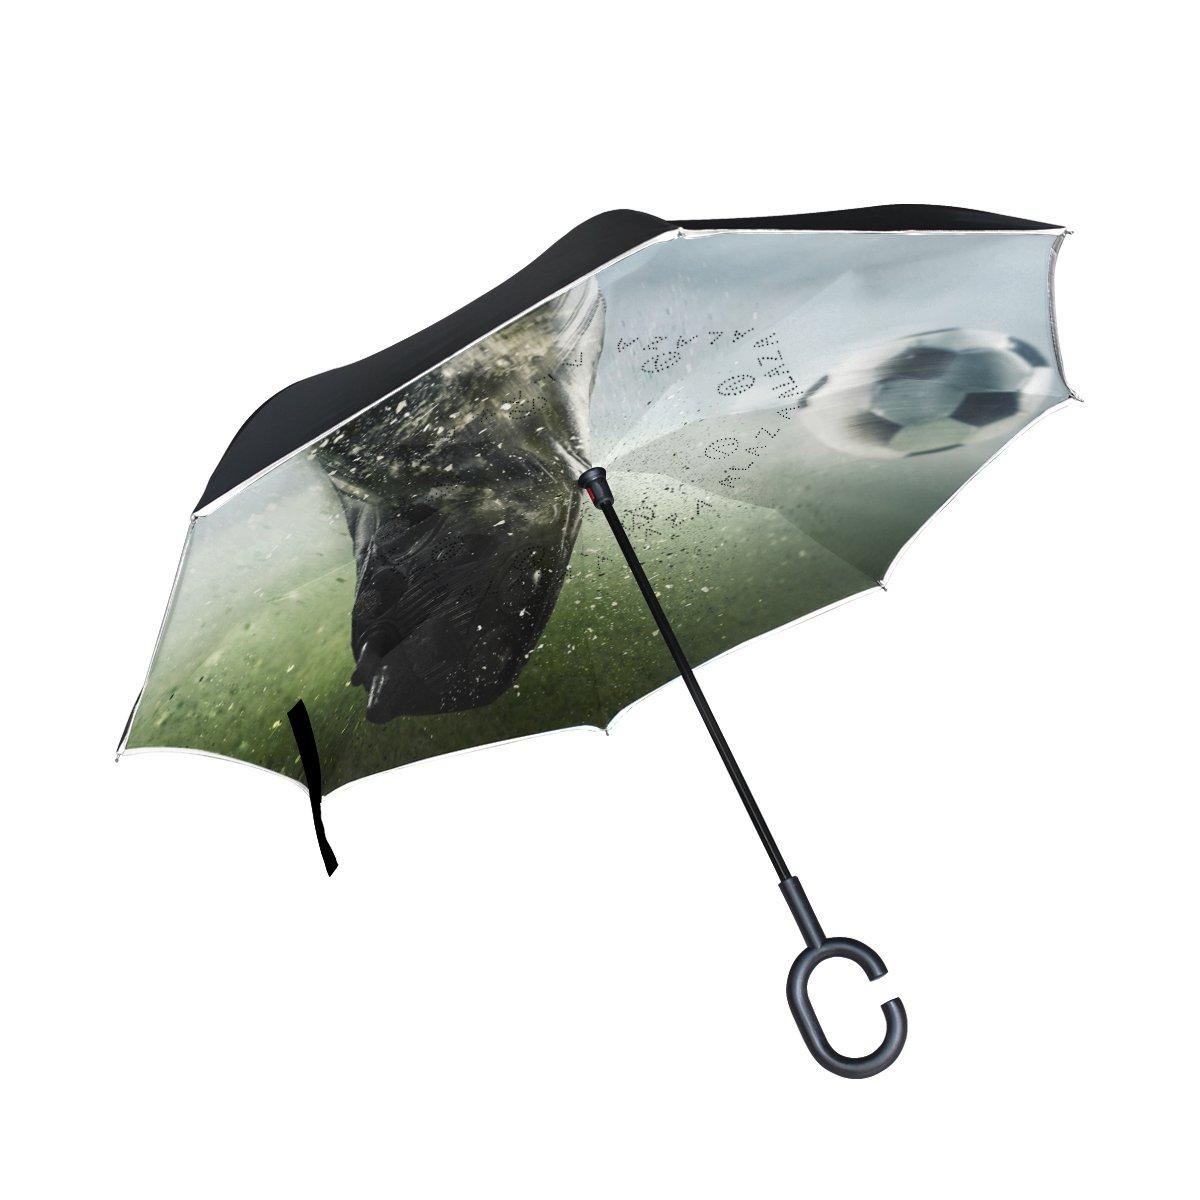 Top Carpenter Double Layer Reverse Inverted Inverted Umbrellasサッカーボールon パターン10 Grass Top C型のハンドルの車アウトドア パターン10 B07FMKNTM2, ミヤシロマチ:6f336012 --- ijpba.info